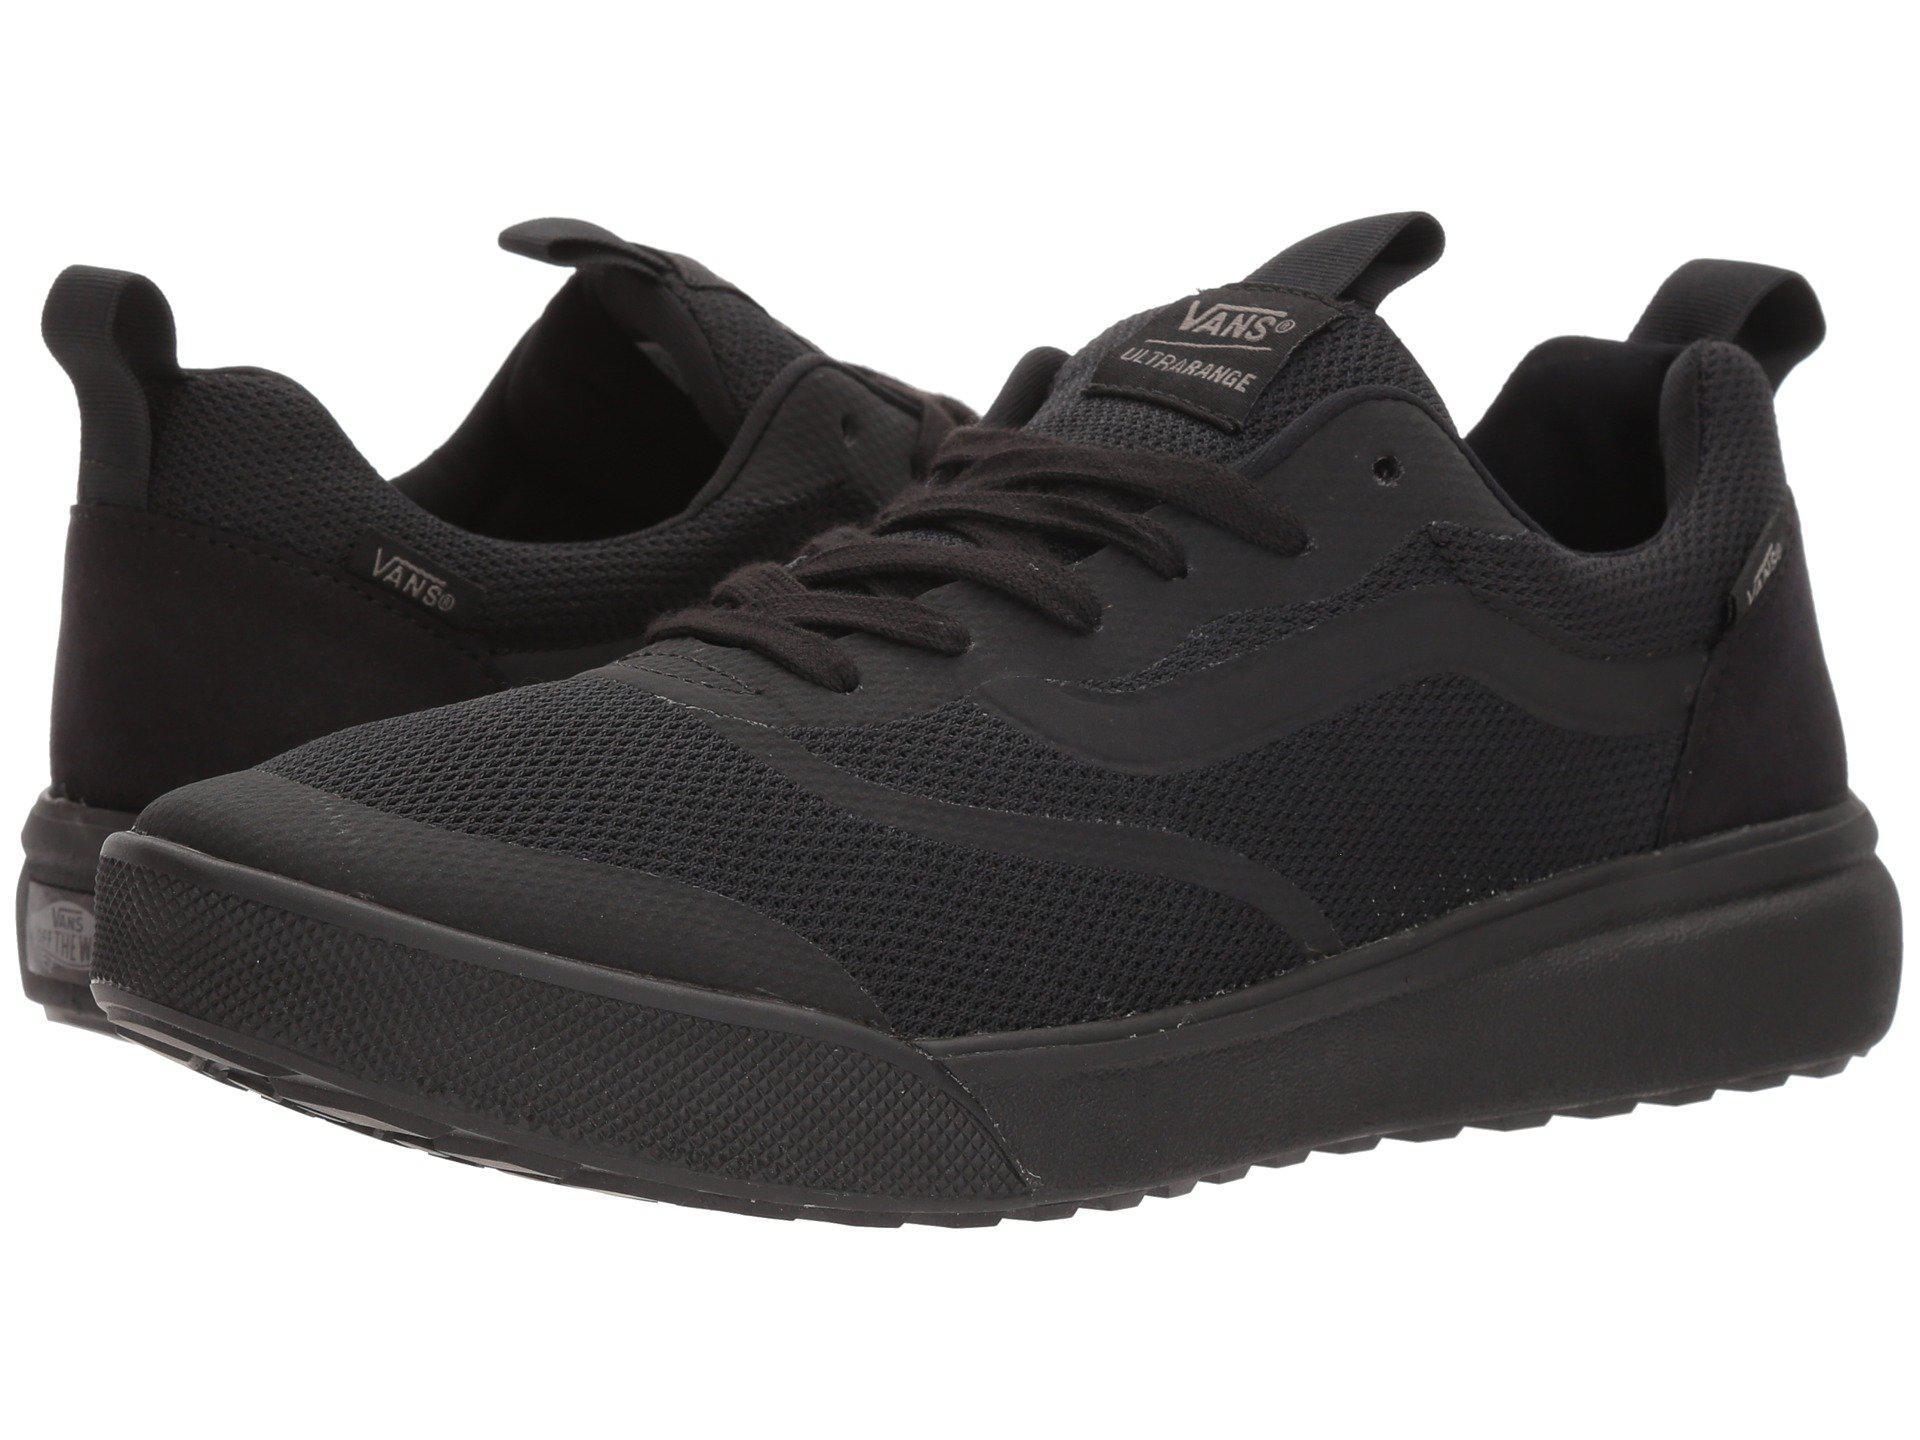 9f27dfe53d9a9e Vans - Ultrarange Rapidweld  18 (black black) Skate Shoes for Men -. View  fullscreen